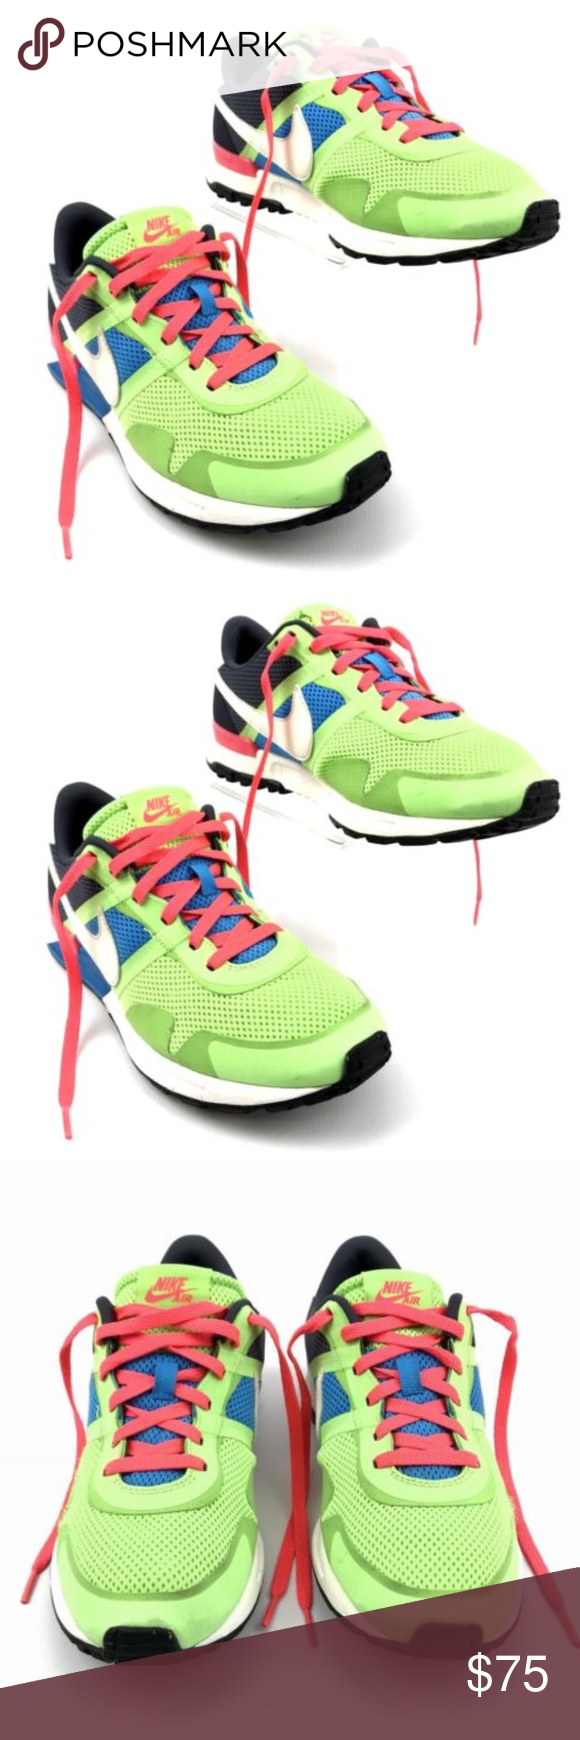 36e8586e3c5 Mens Nike Air Pegasus 83 30 Mens Nike Air Pegasus 83 30 599482-314 Flash  Lime Blue Hero Gridiron Sail Running Shoes •Size  9.5 US